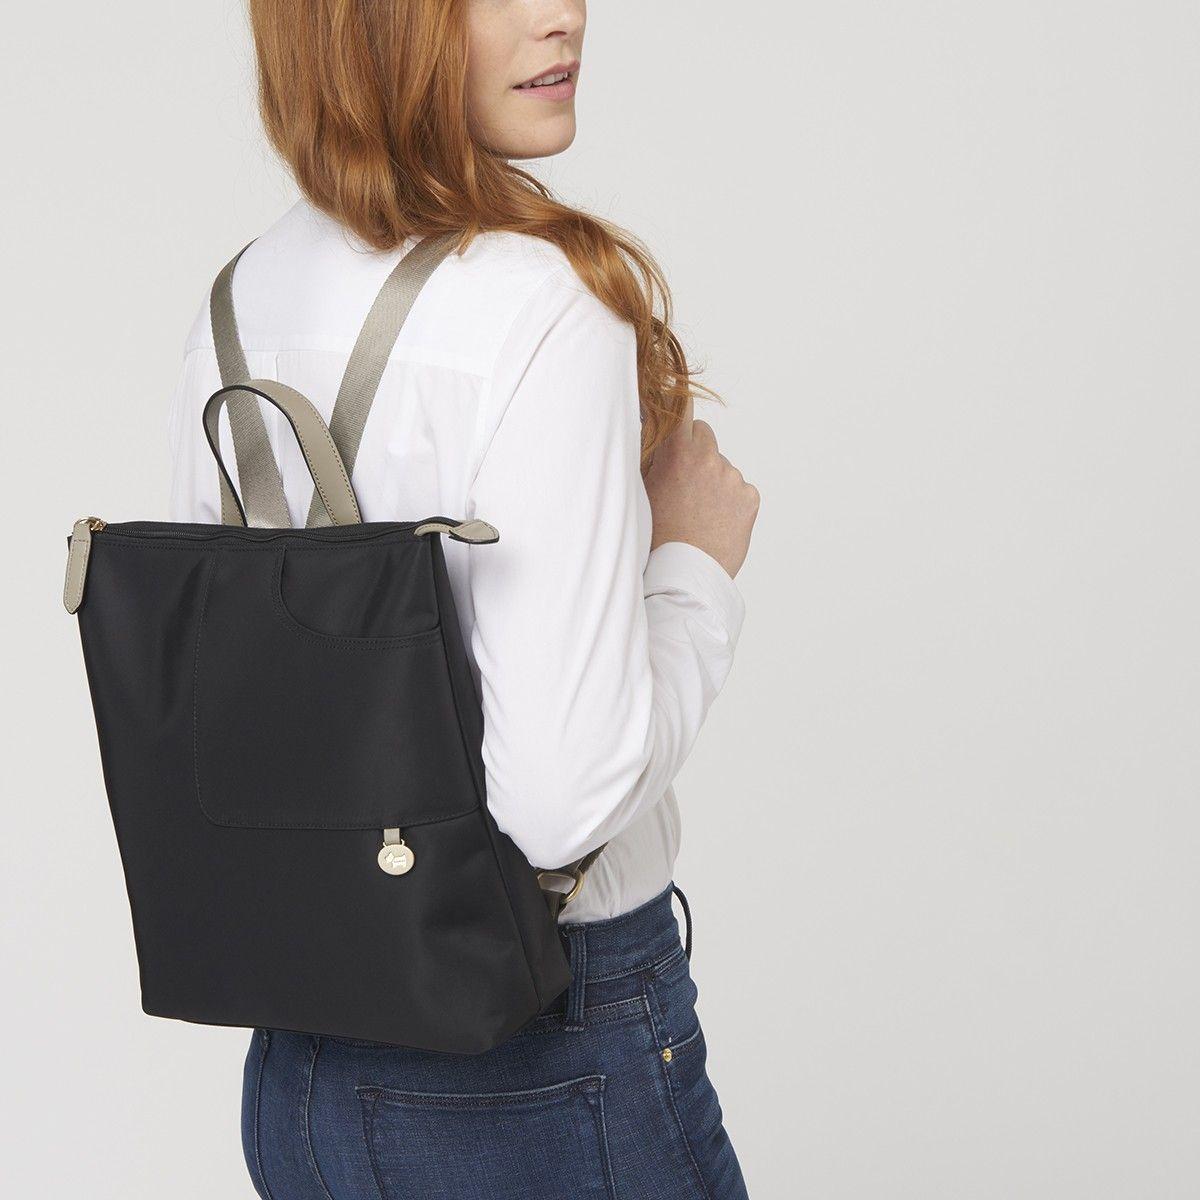 Pocket Essentials Large Zip-top Backpack   Buy Backpacks Online at Radley 7e96c9320df49